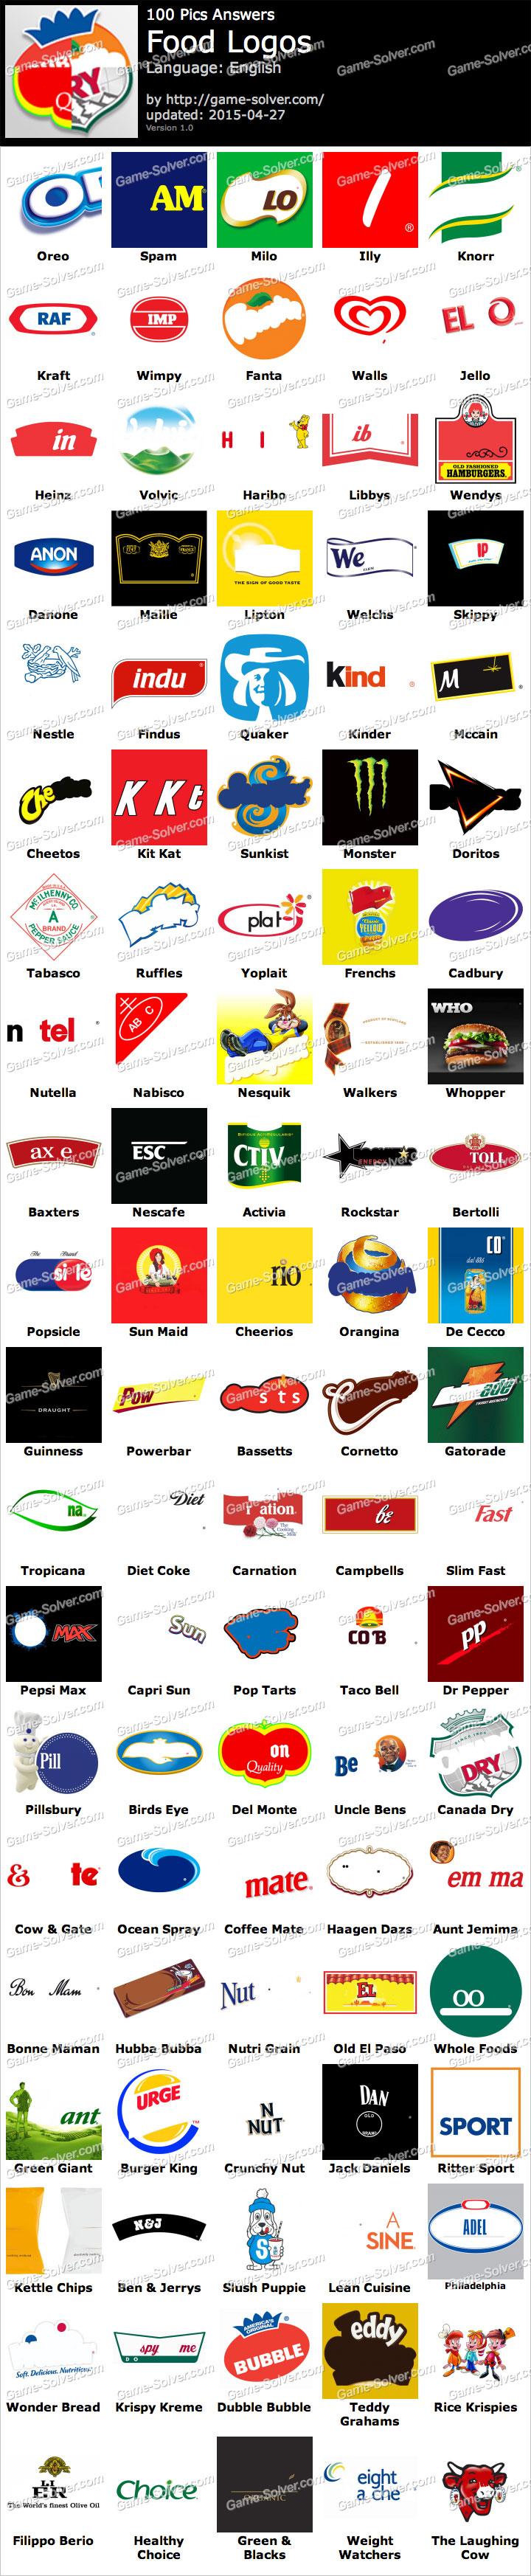 100 Pics Food Logos